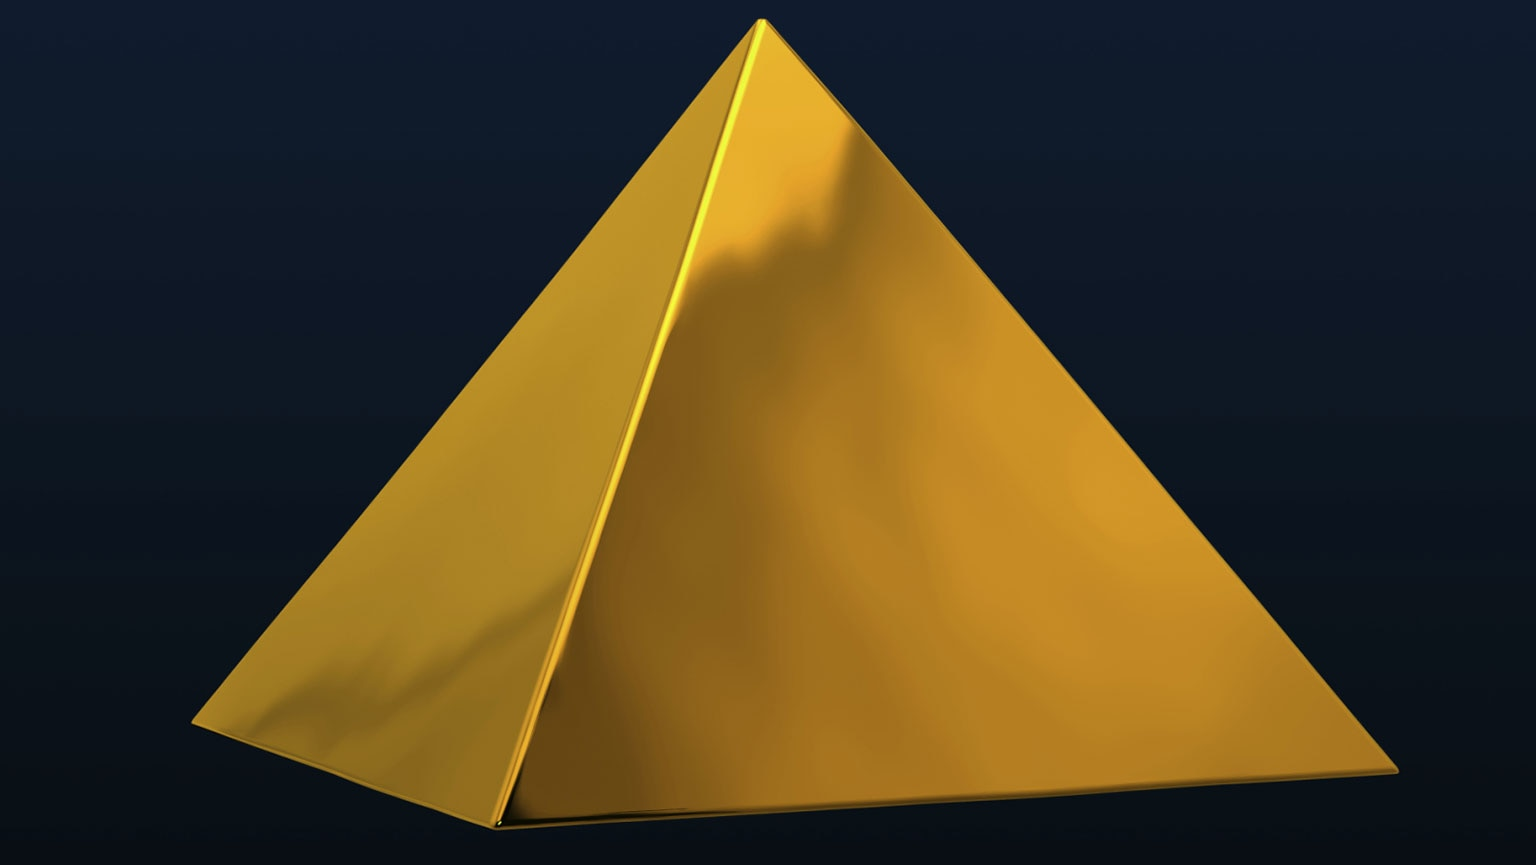 Abstracting the Integral—Pyramids and Dams